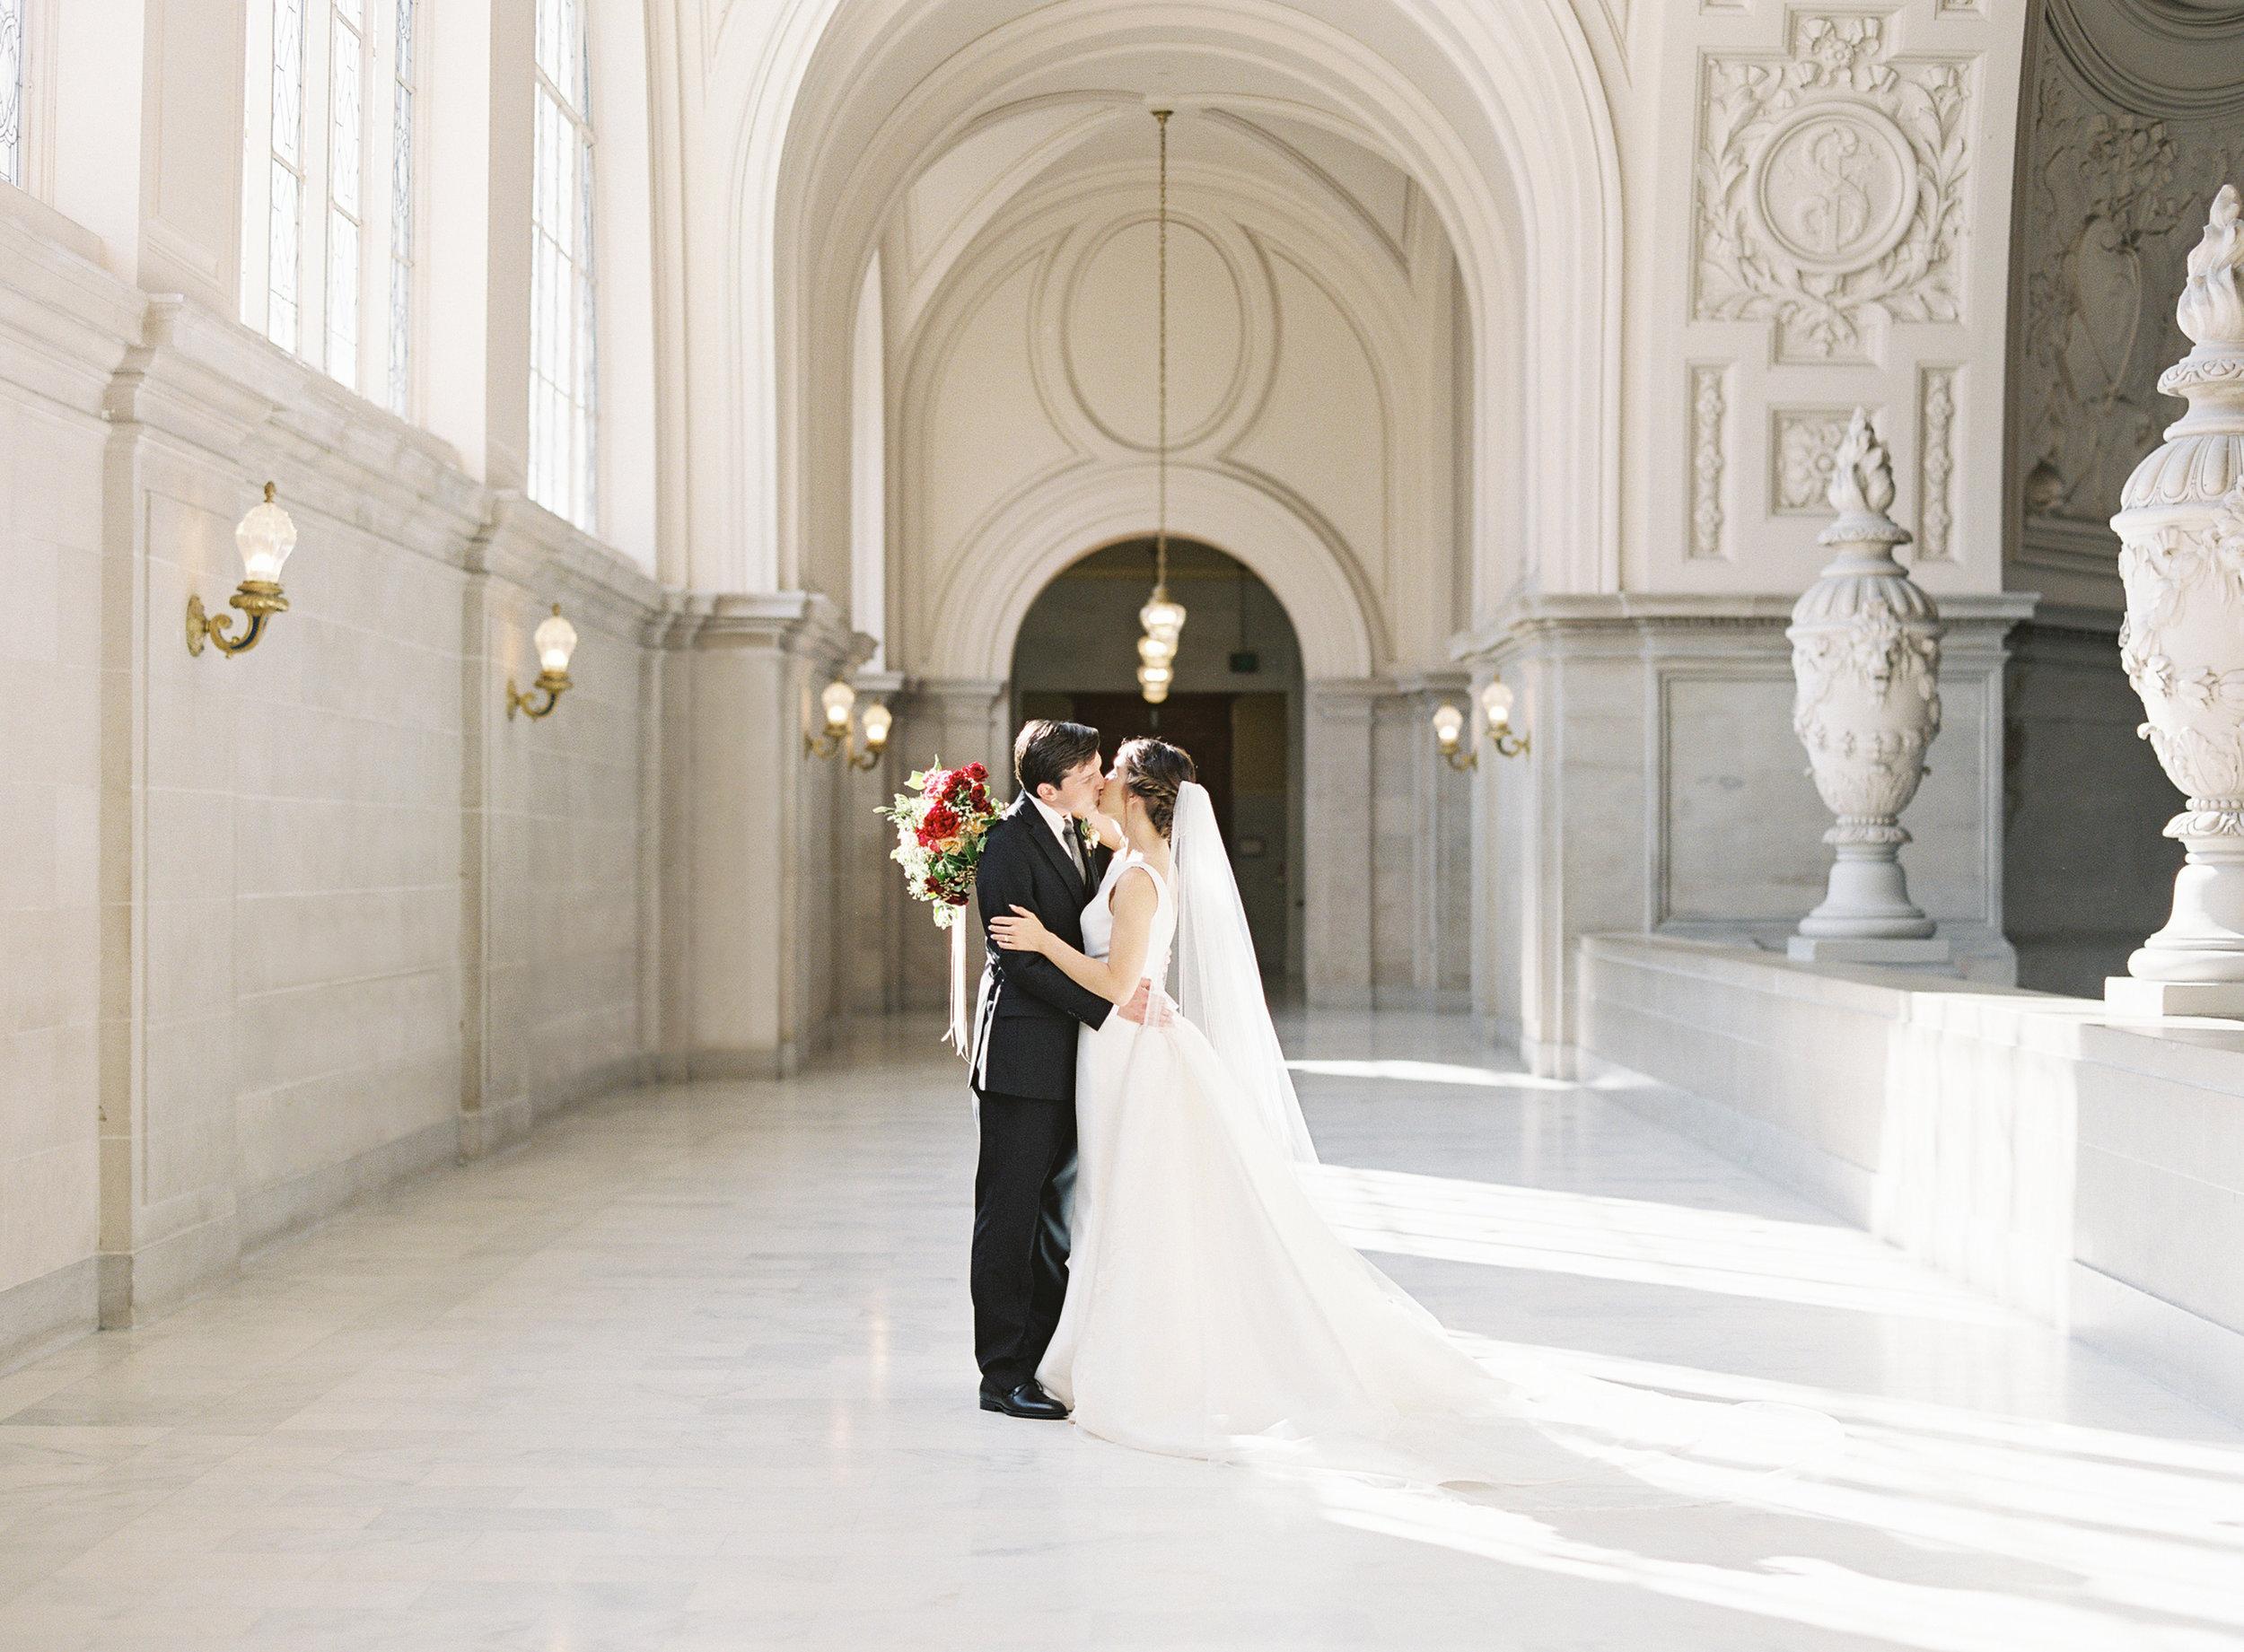 Meghan Mehan Photography - California Wedding Photographer | San Francisco City Hall Wedding 031.jpg